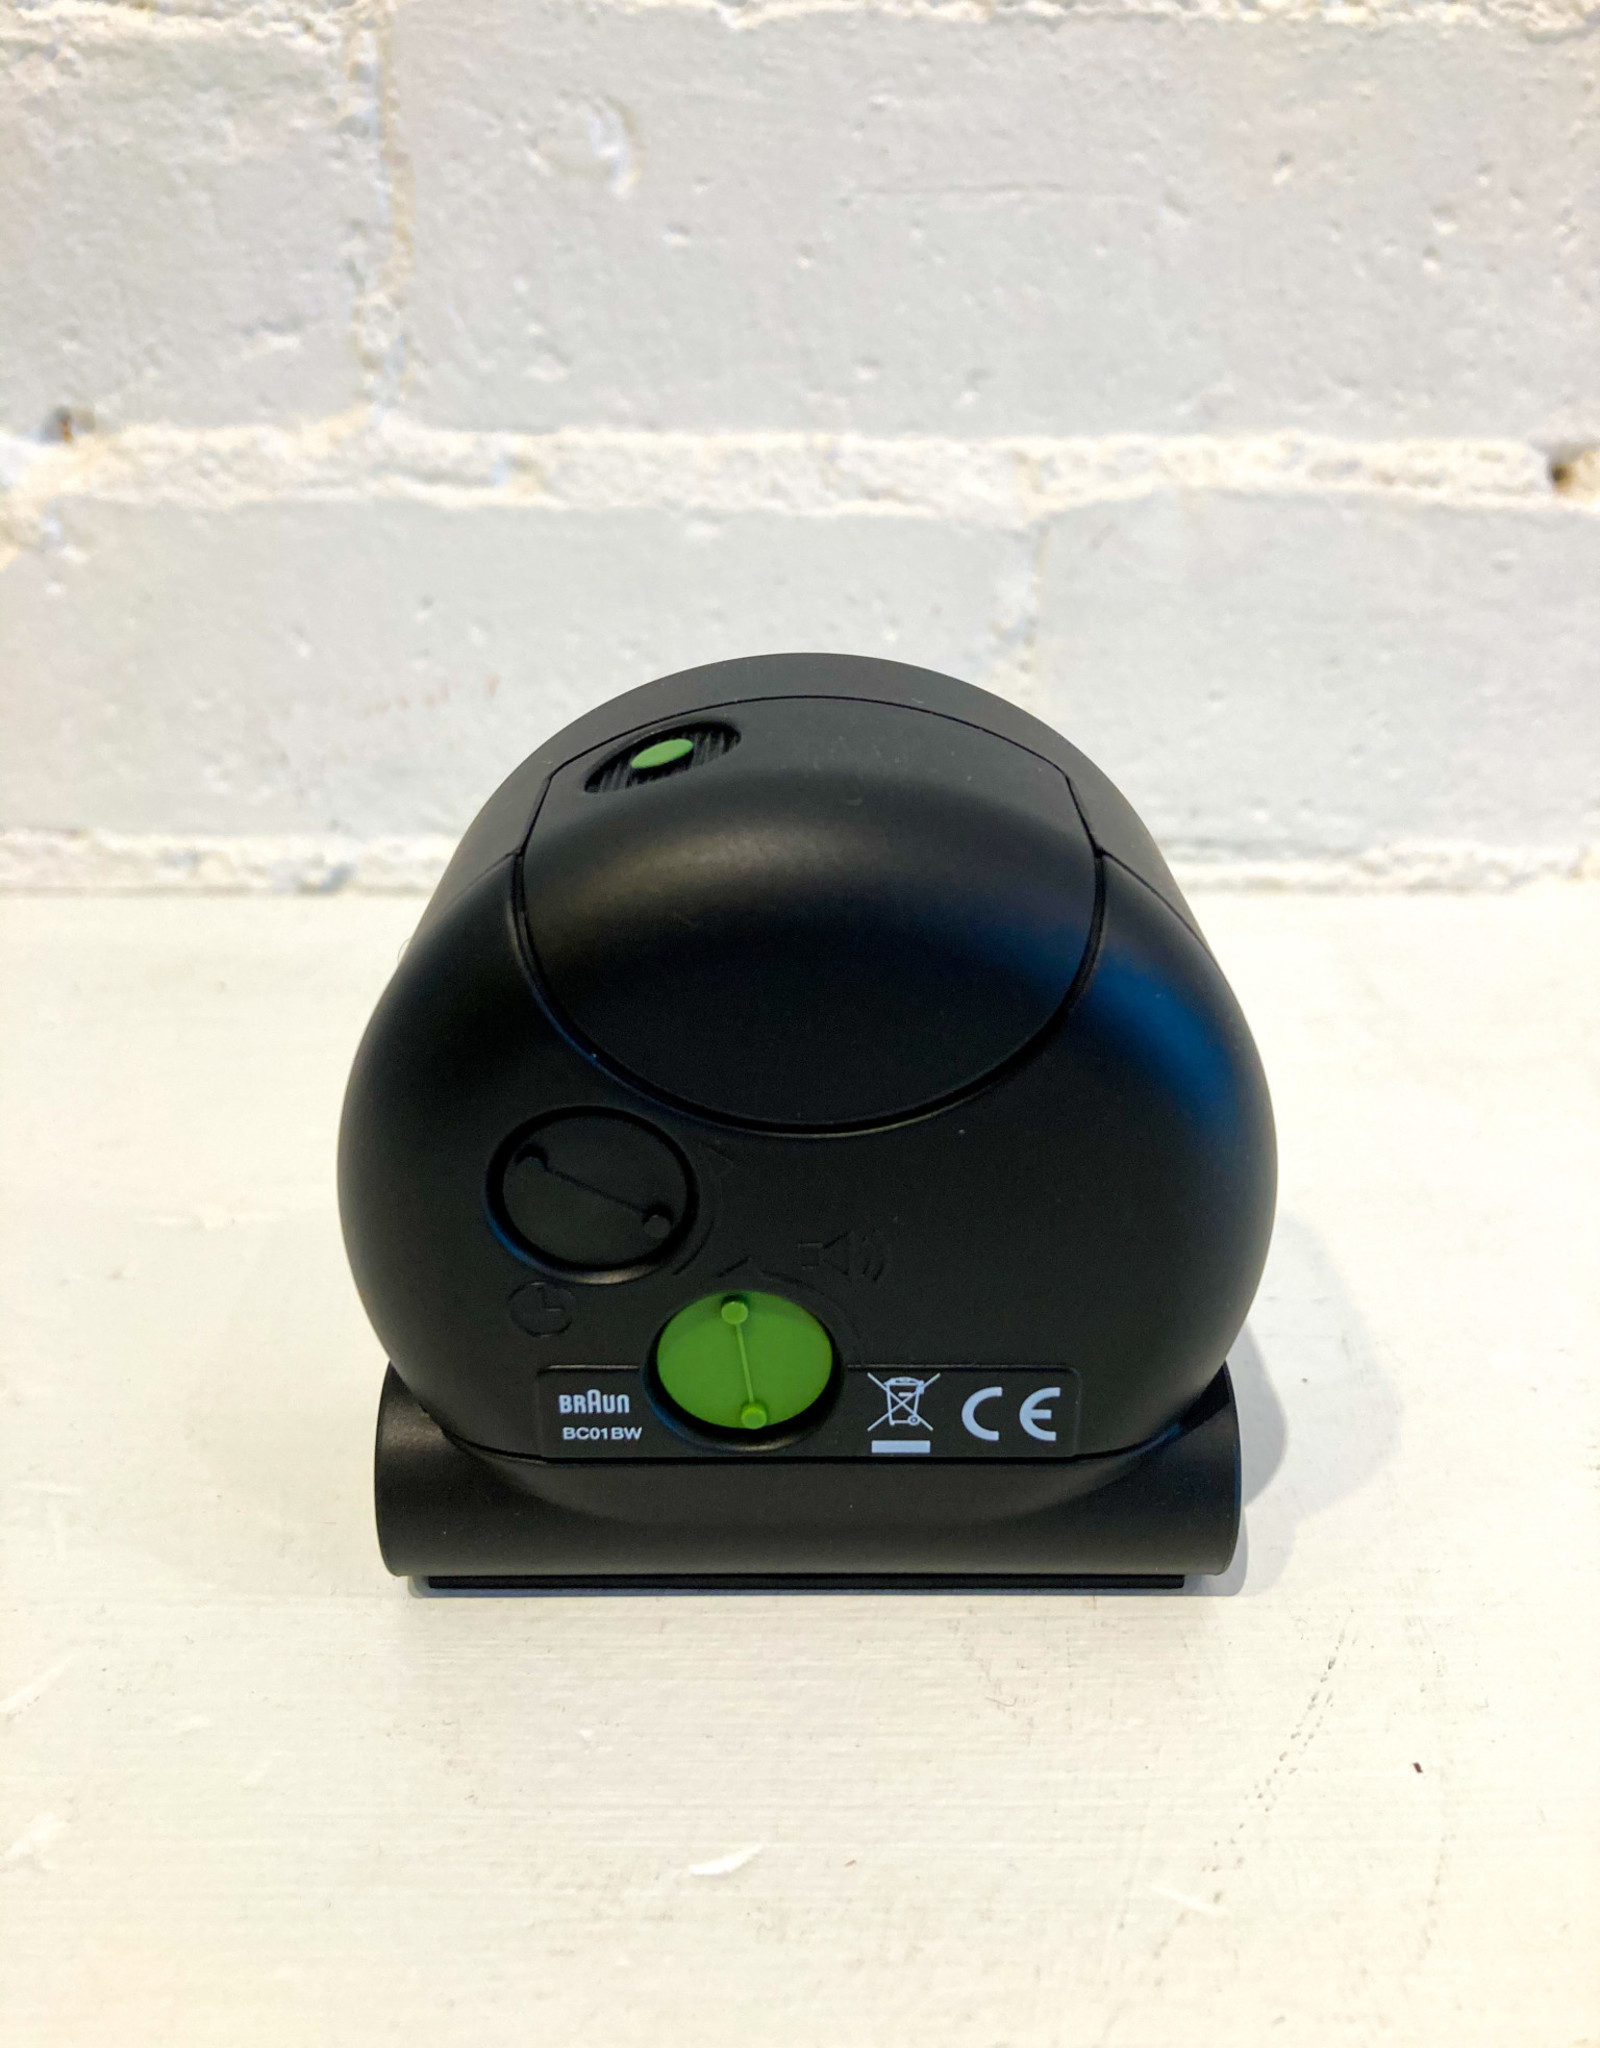 Braun Alarm Clock: Black BC01BW